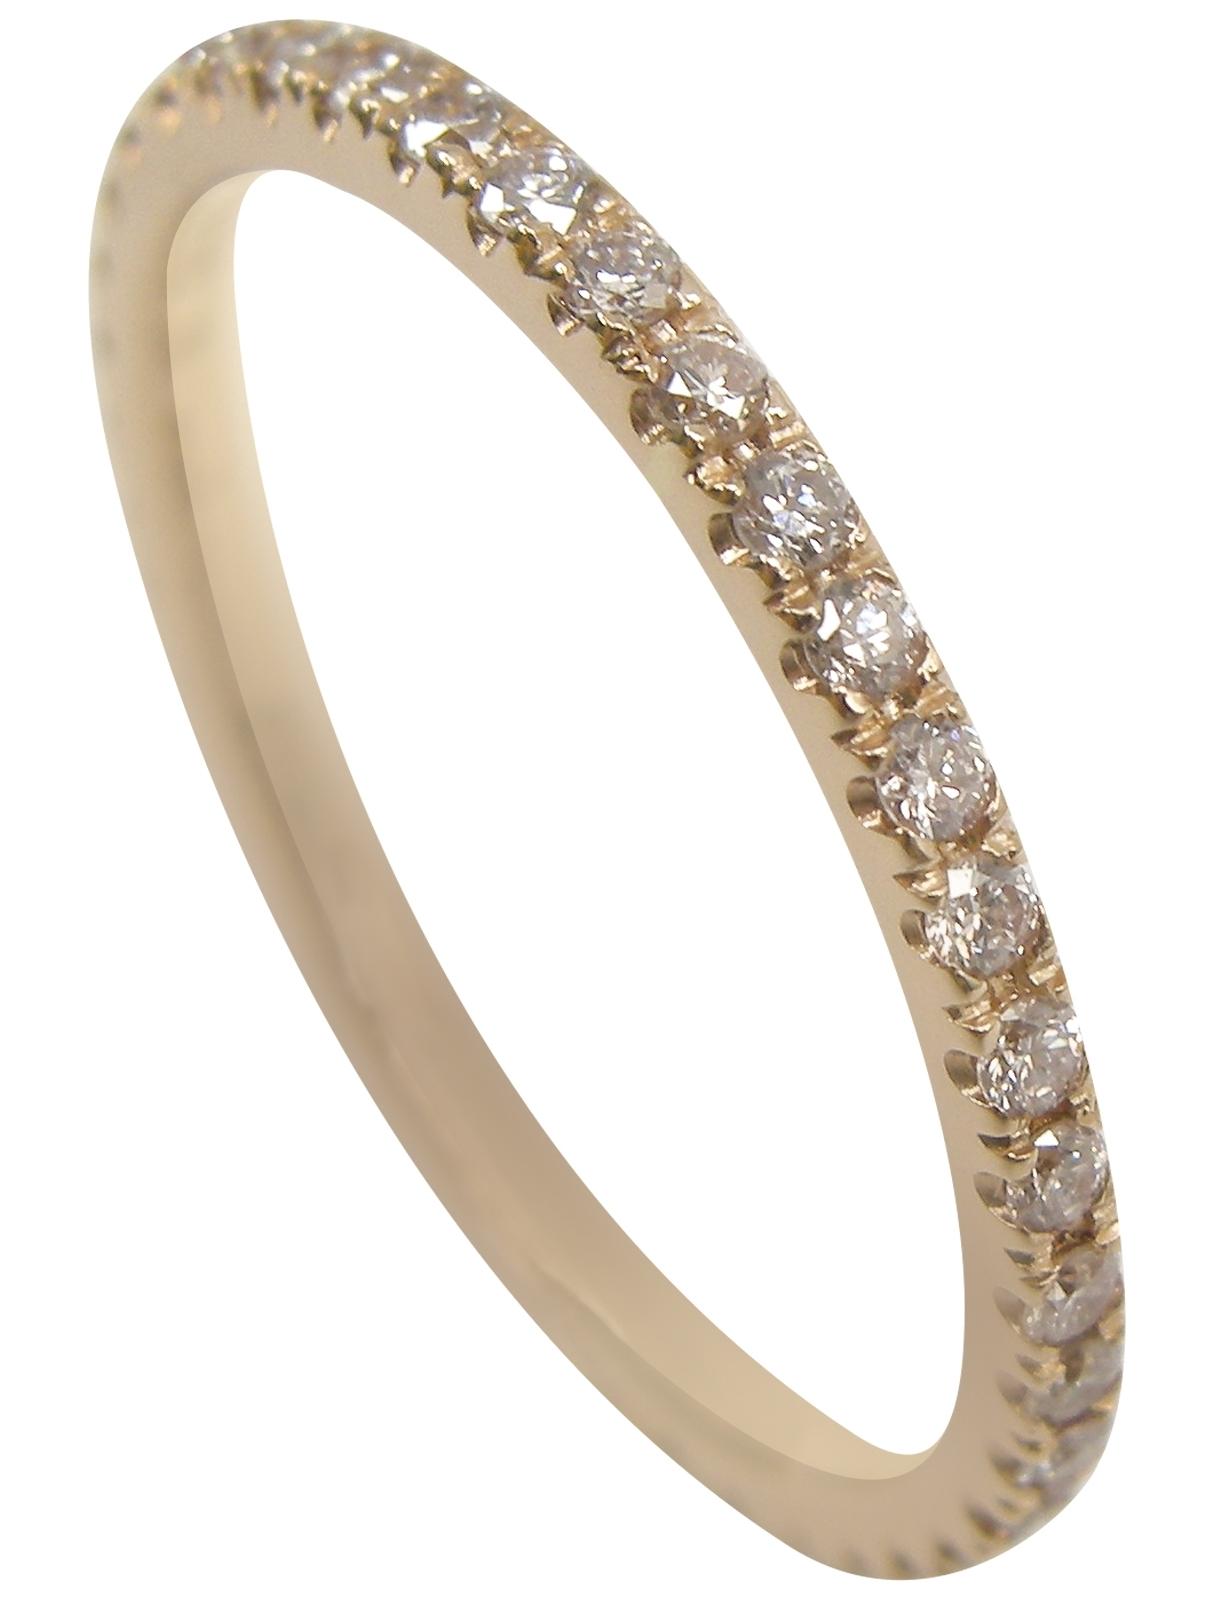 PINK DIAMOND & ROSE GOLD DIAMOND ETERNITY RING BESPOKE FINE JEWELLERY BY SHAHINA HATTA